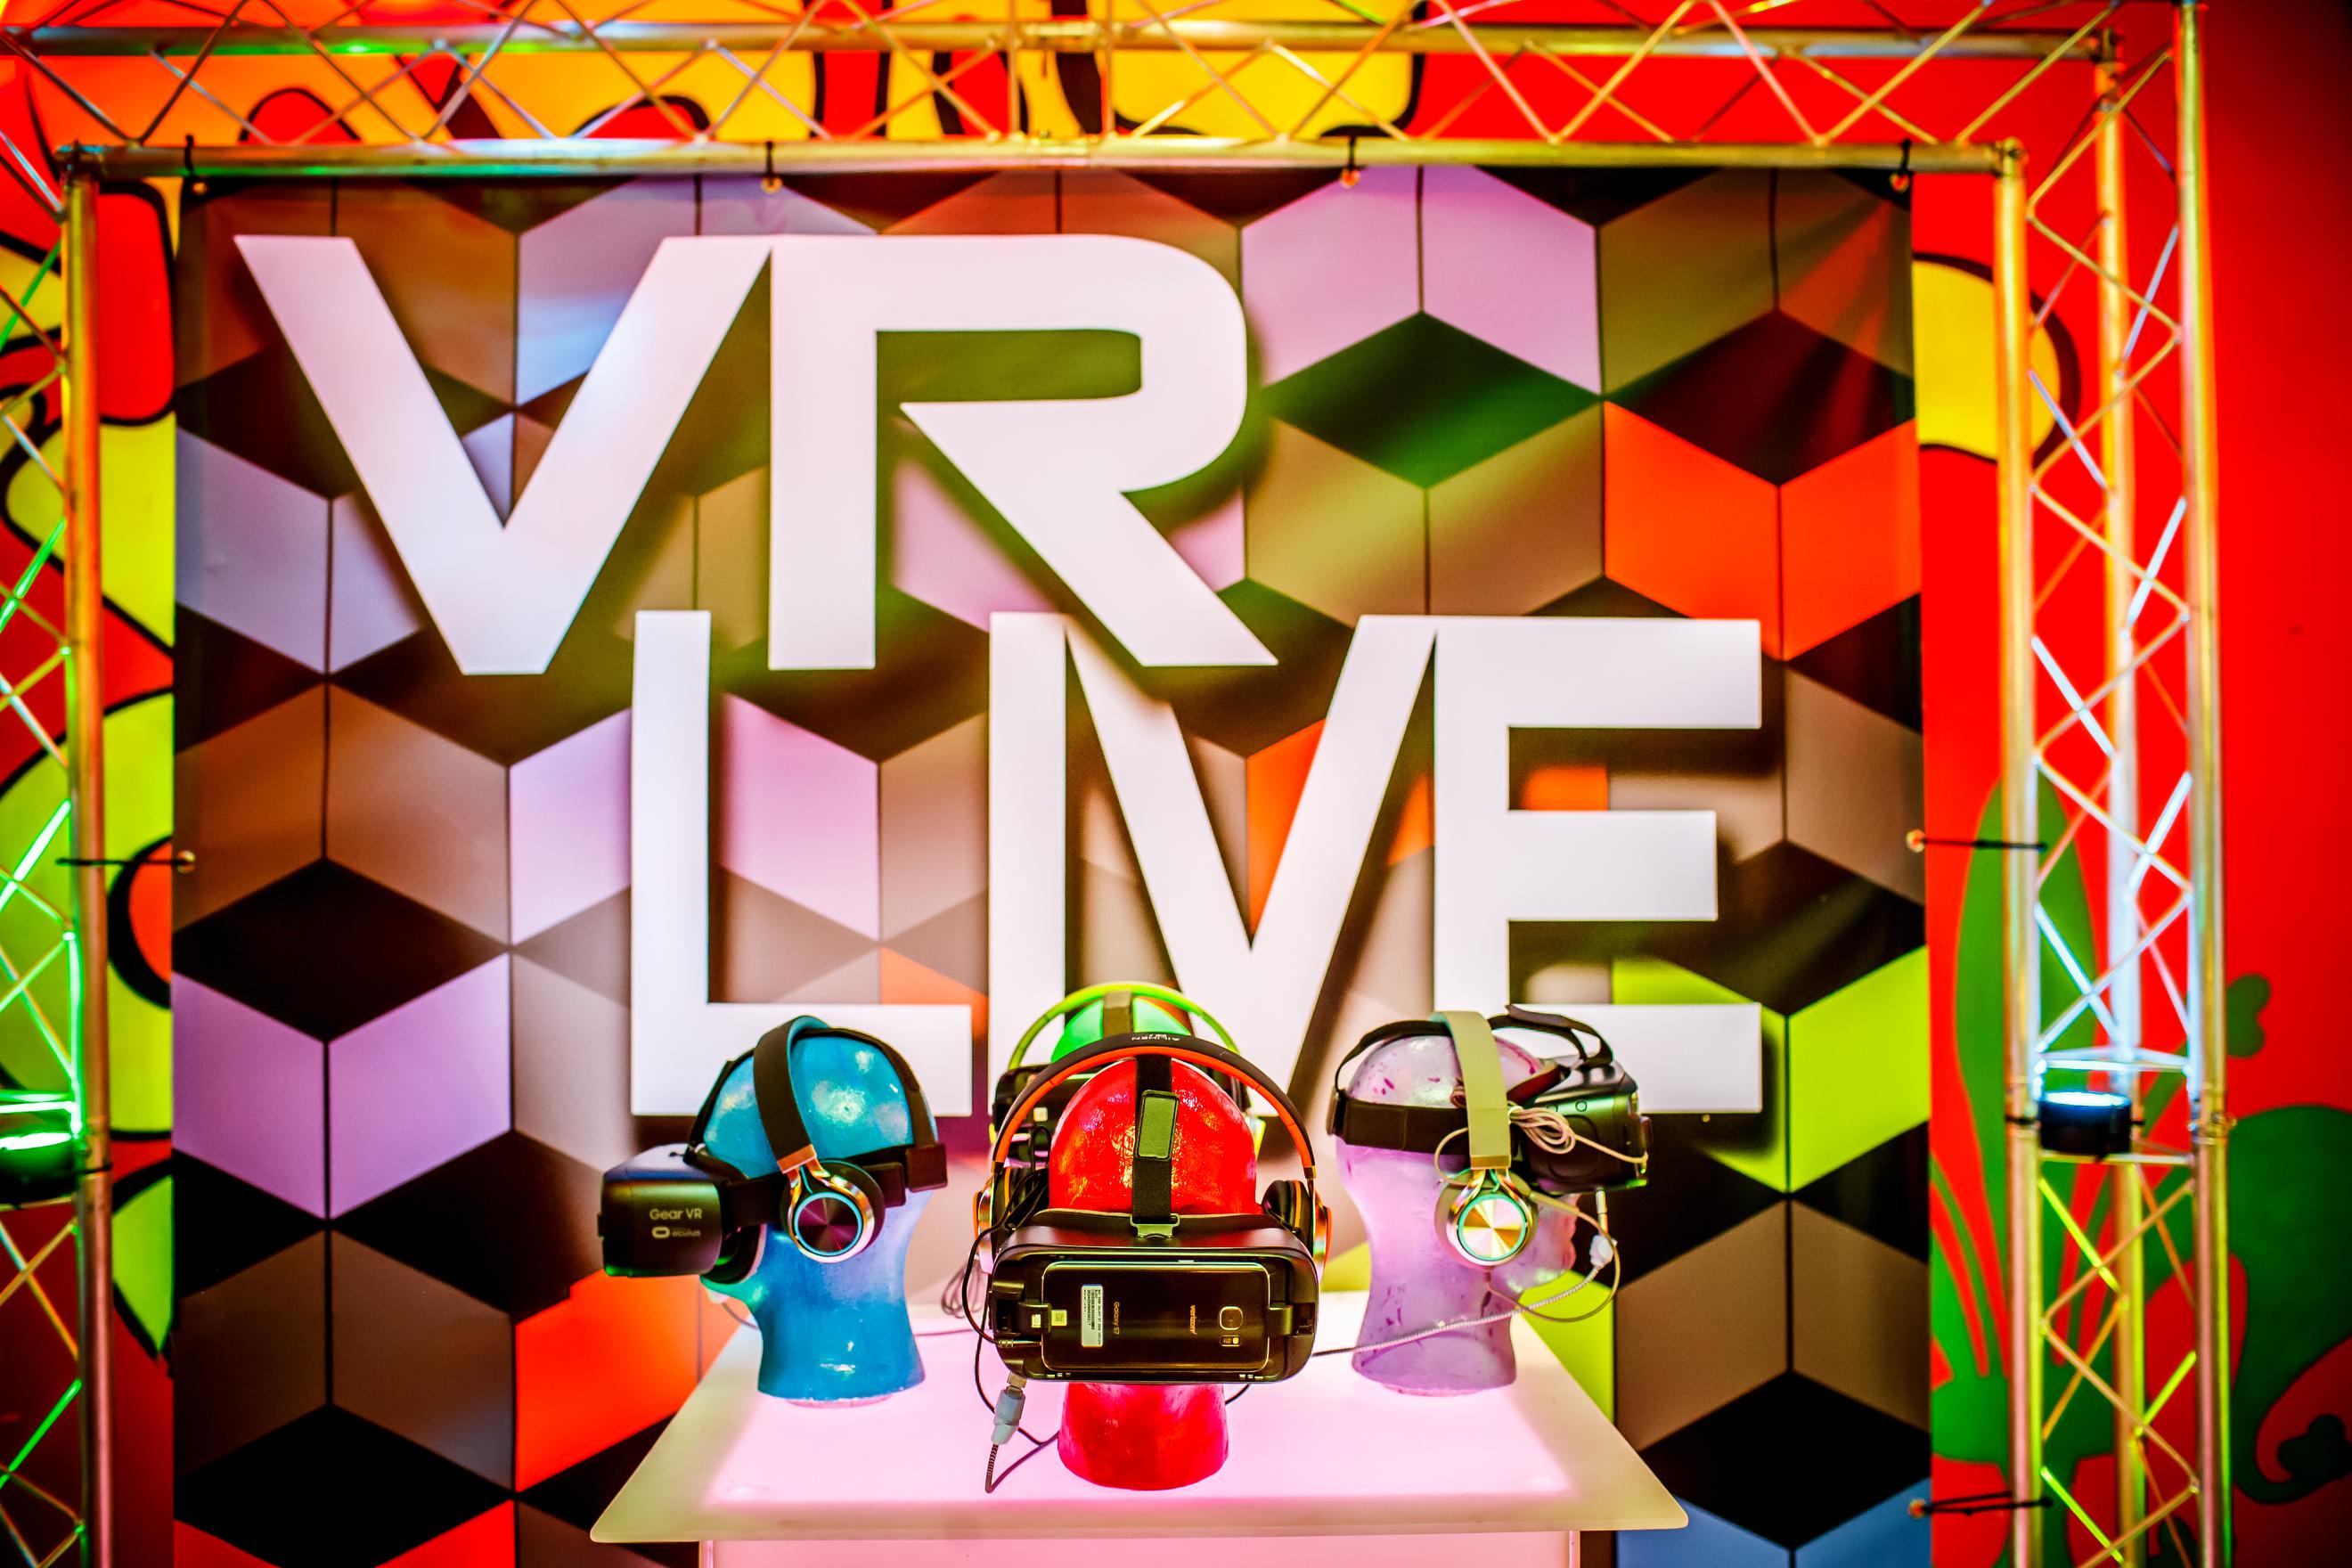 VR Live